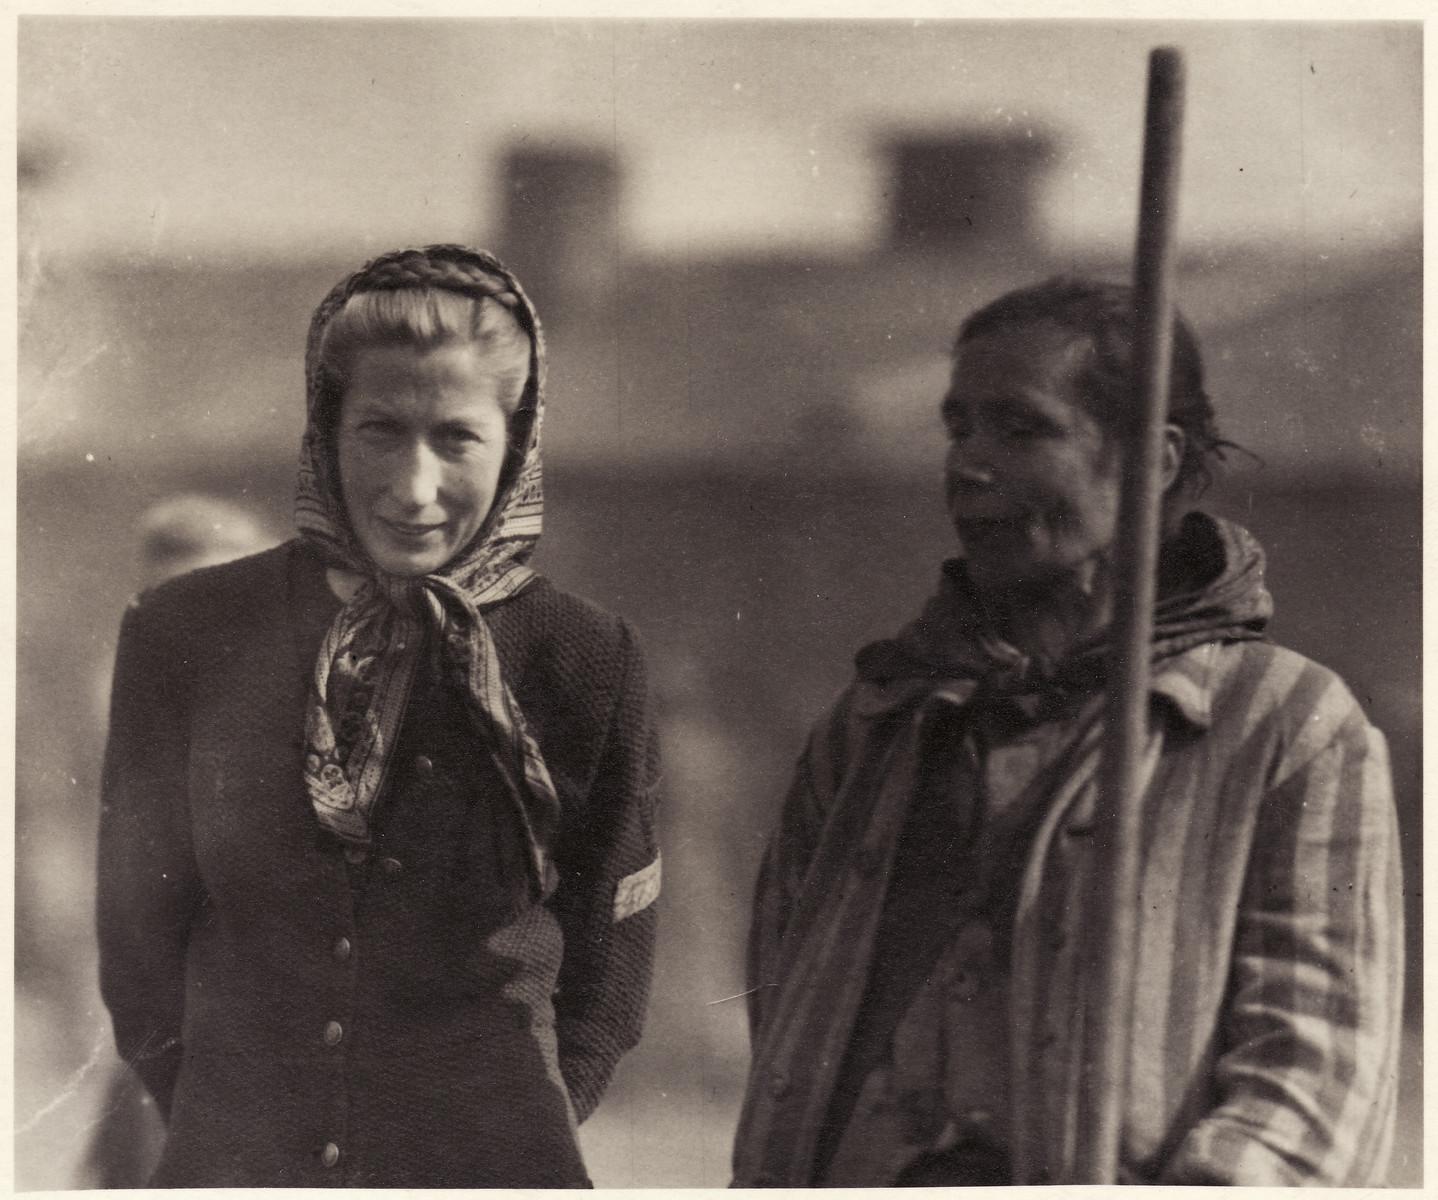 Close-up portrait of two female survivors of the Bergen-Belsen concentration camp.